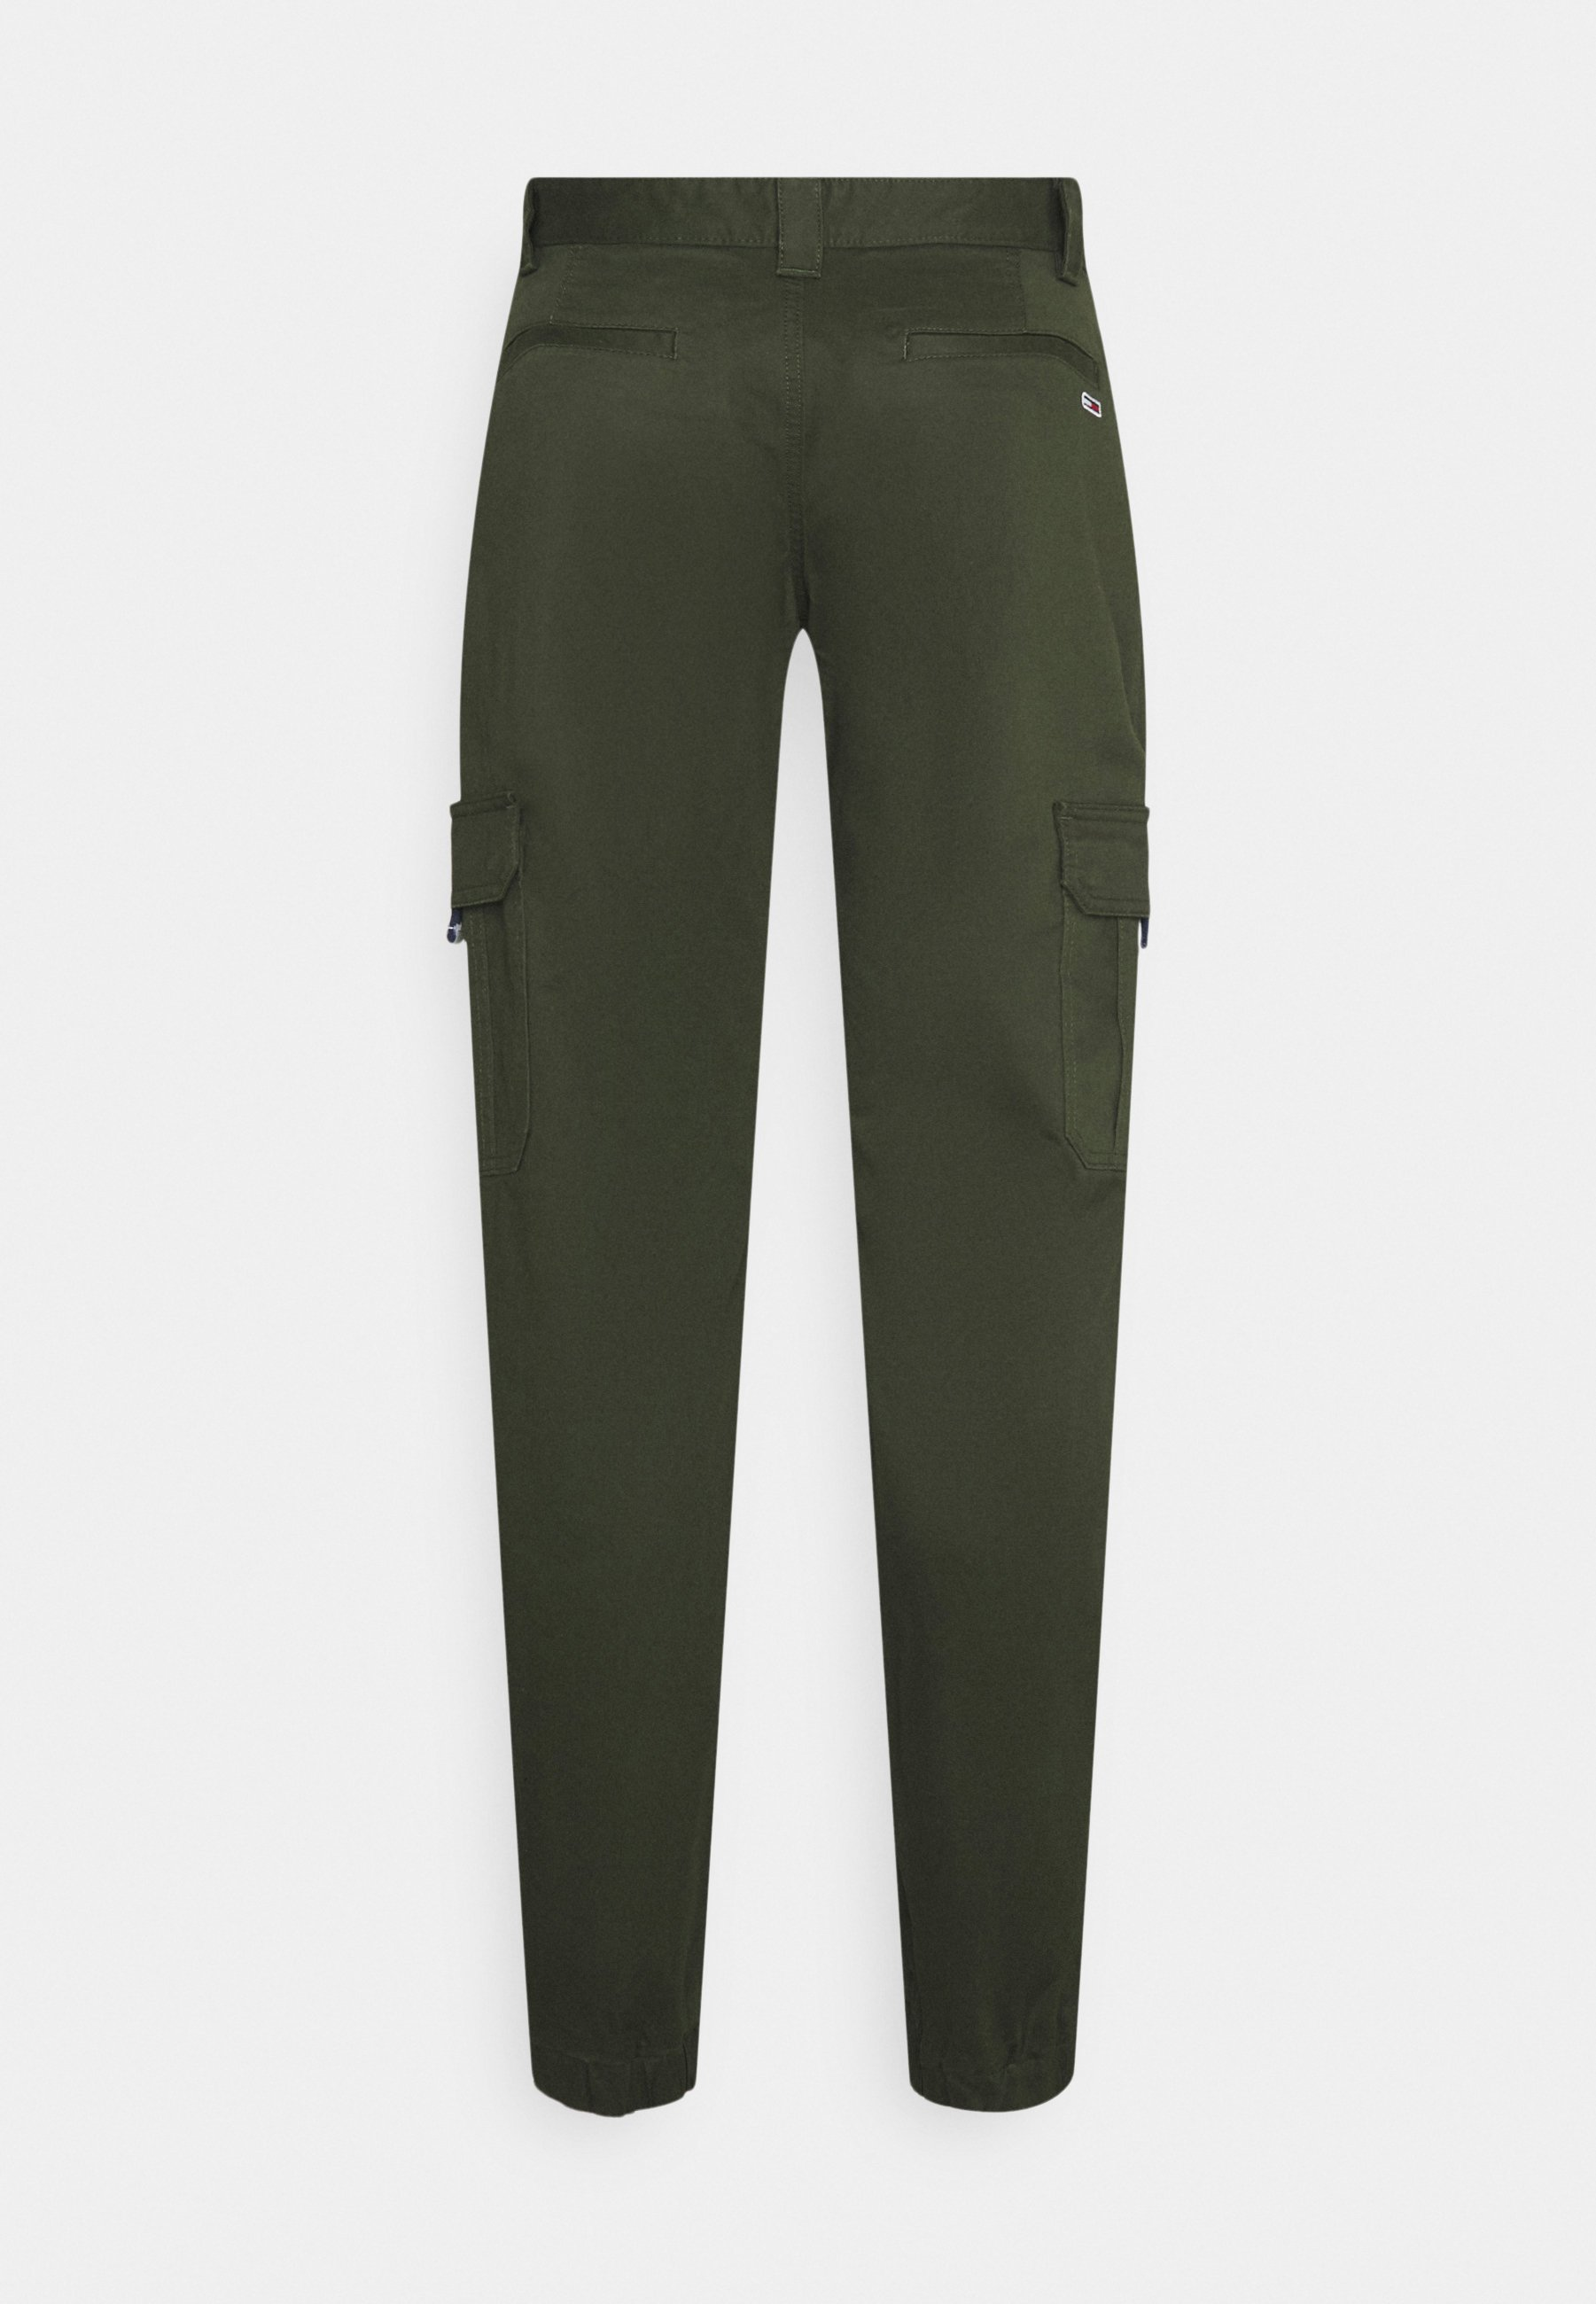 Homme SCANTON  PANT - Pantalon cargo